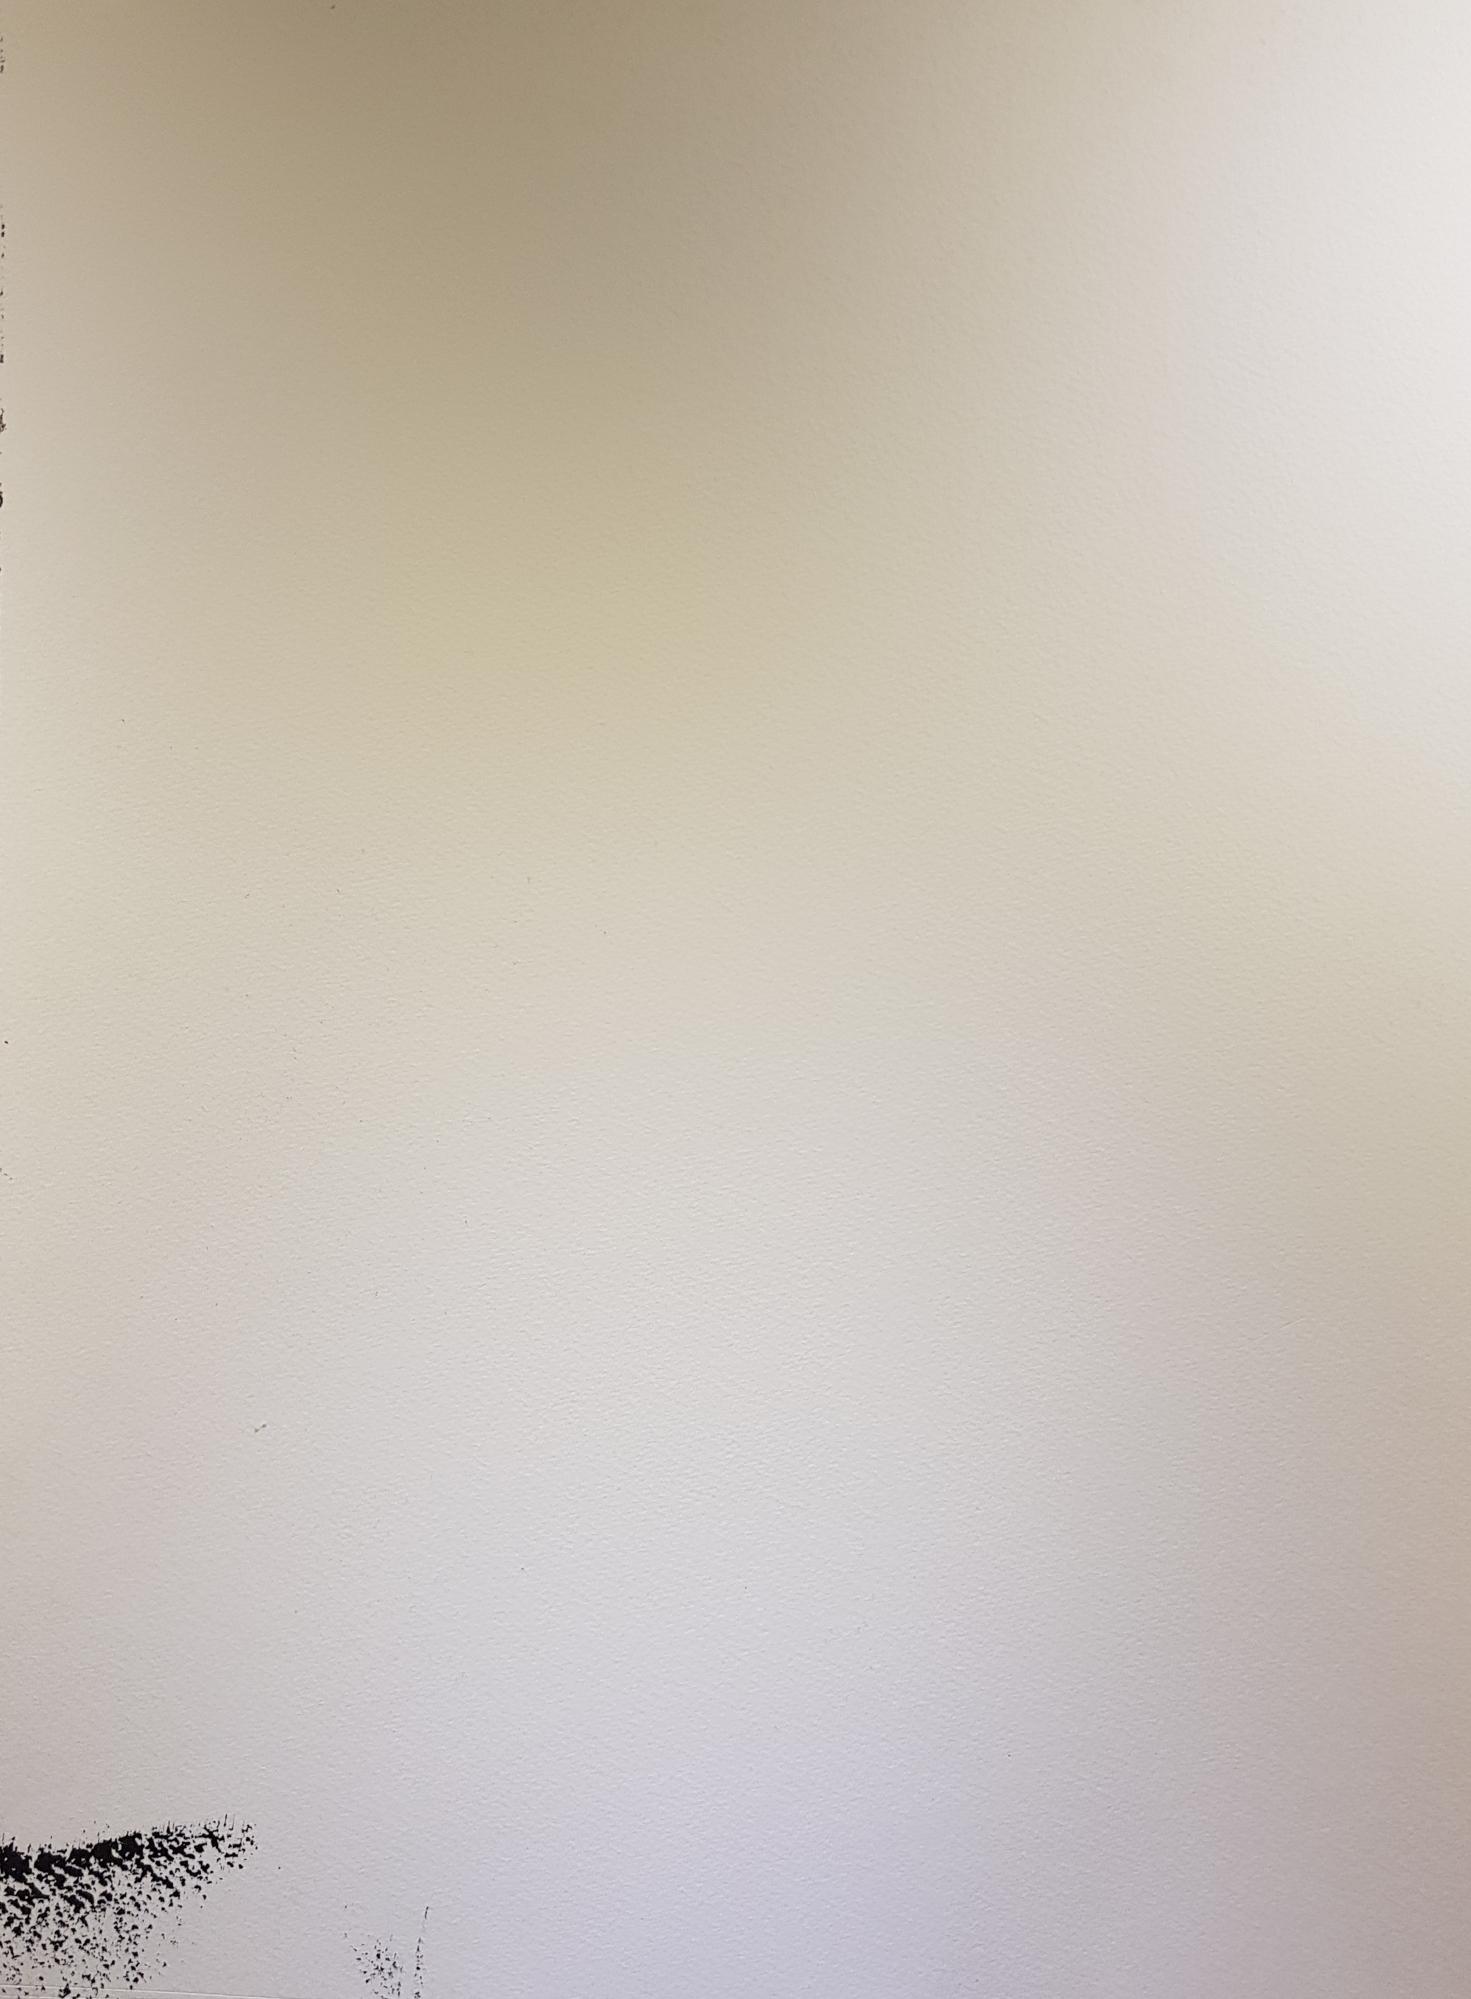 Оборот. Янкилевский Владимир Борисович. Без названия №3. Из цикла Женщина у моря